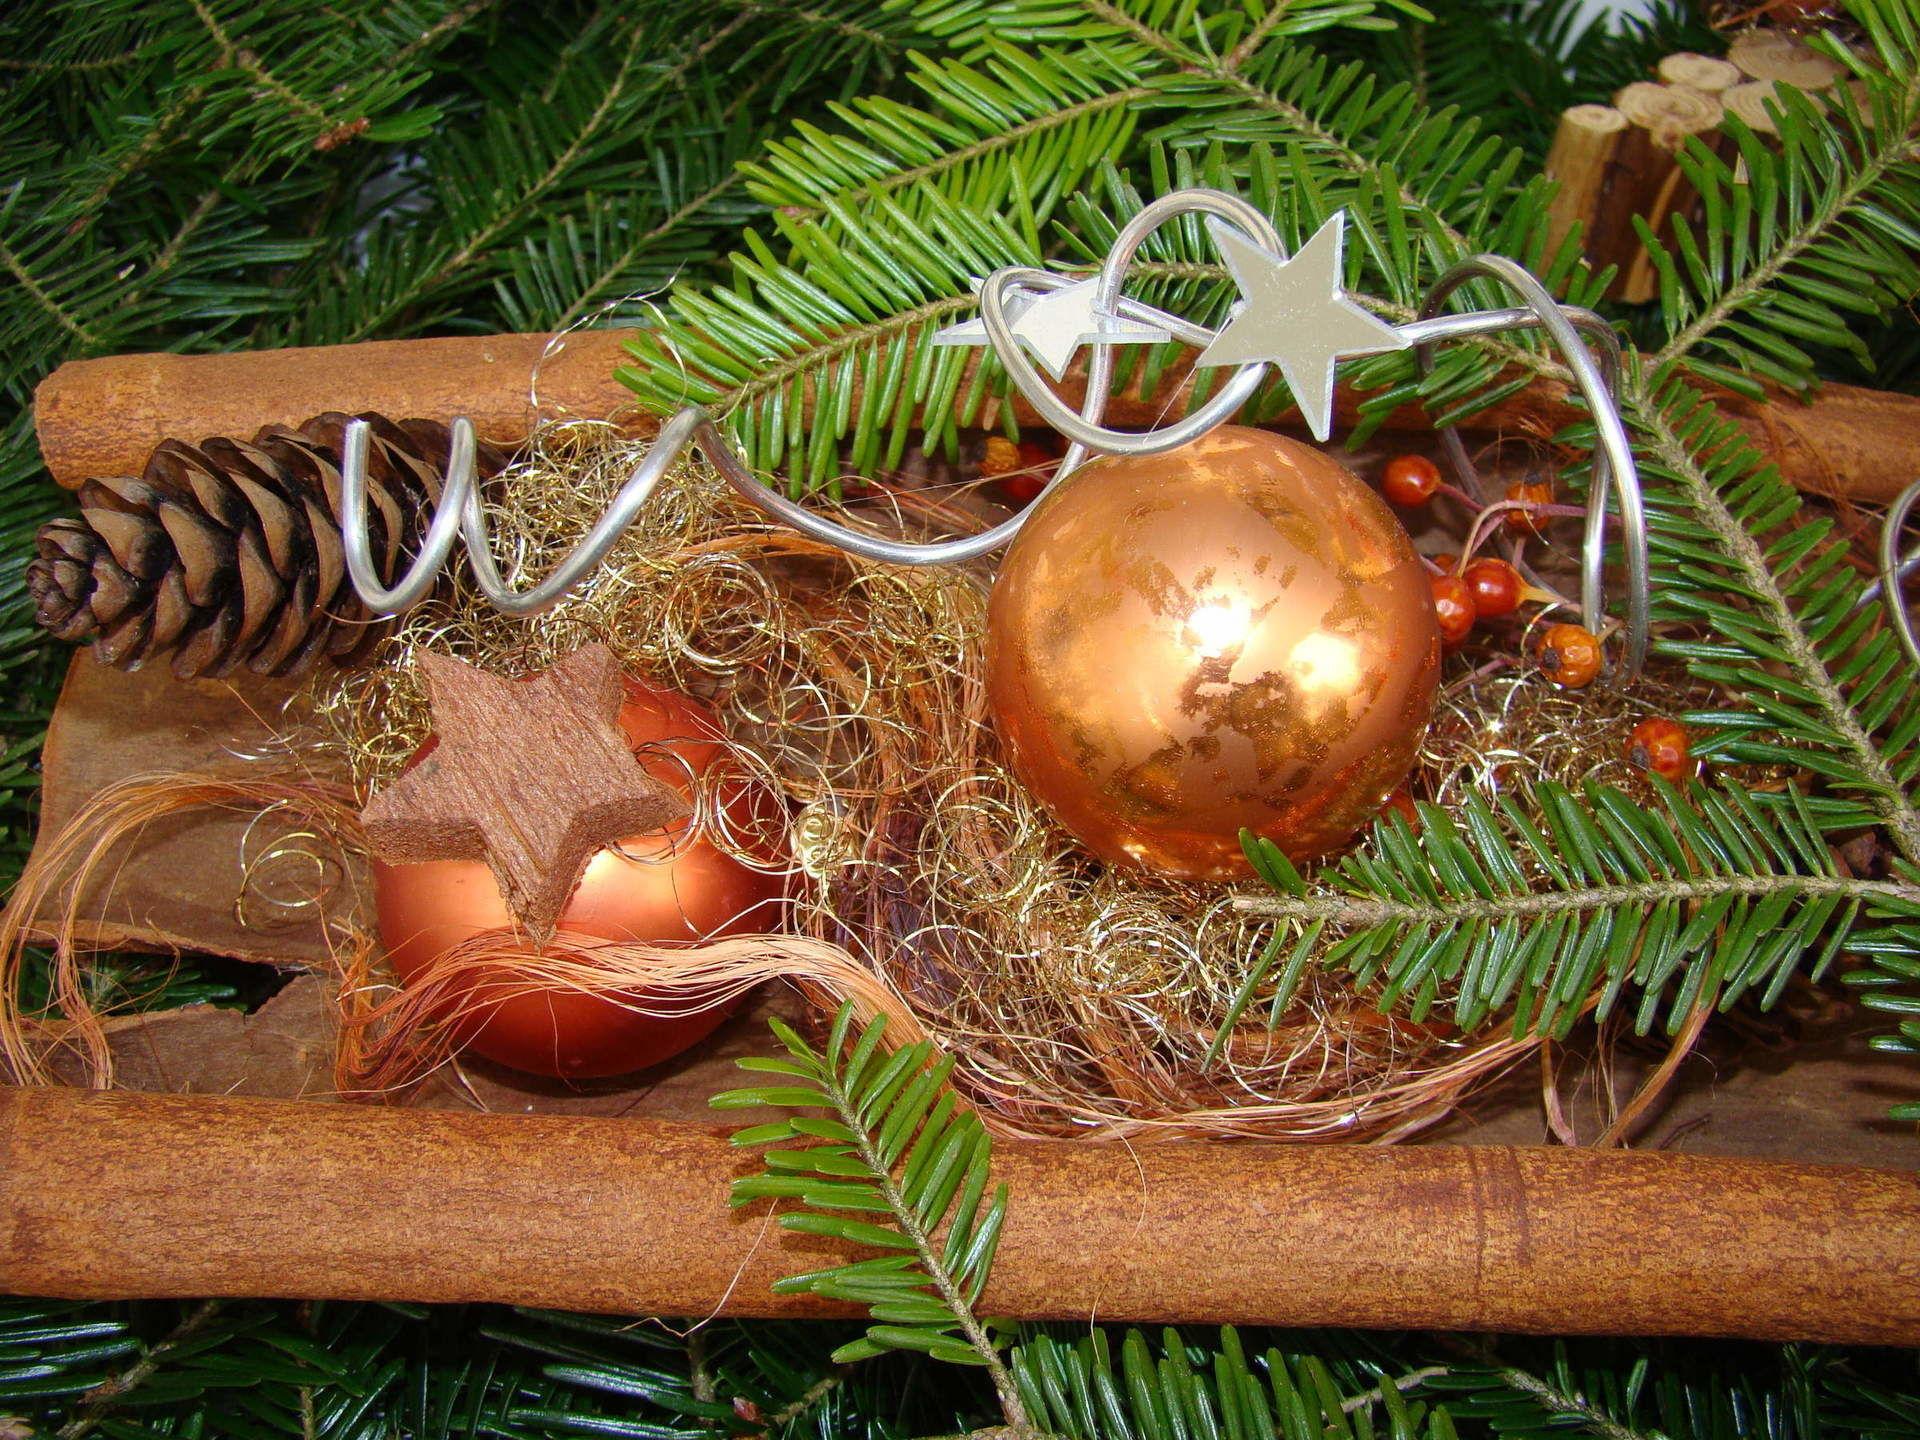 weihnachten silvester urlaub cuxhaven nordsee wattenmeer. Black Bedroom Furniture Sets. Home Design Ideas